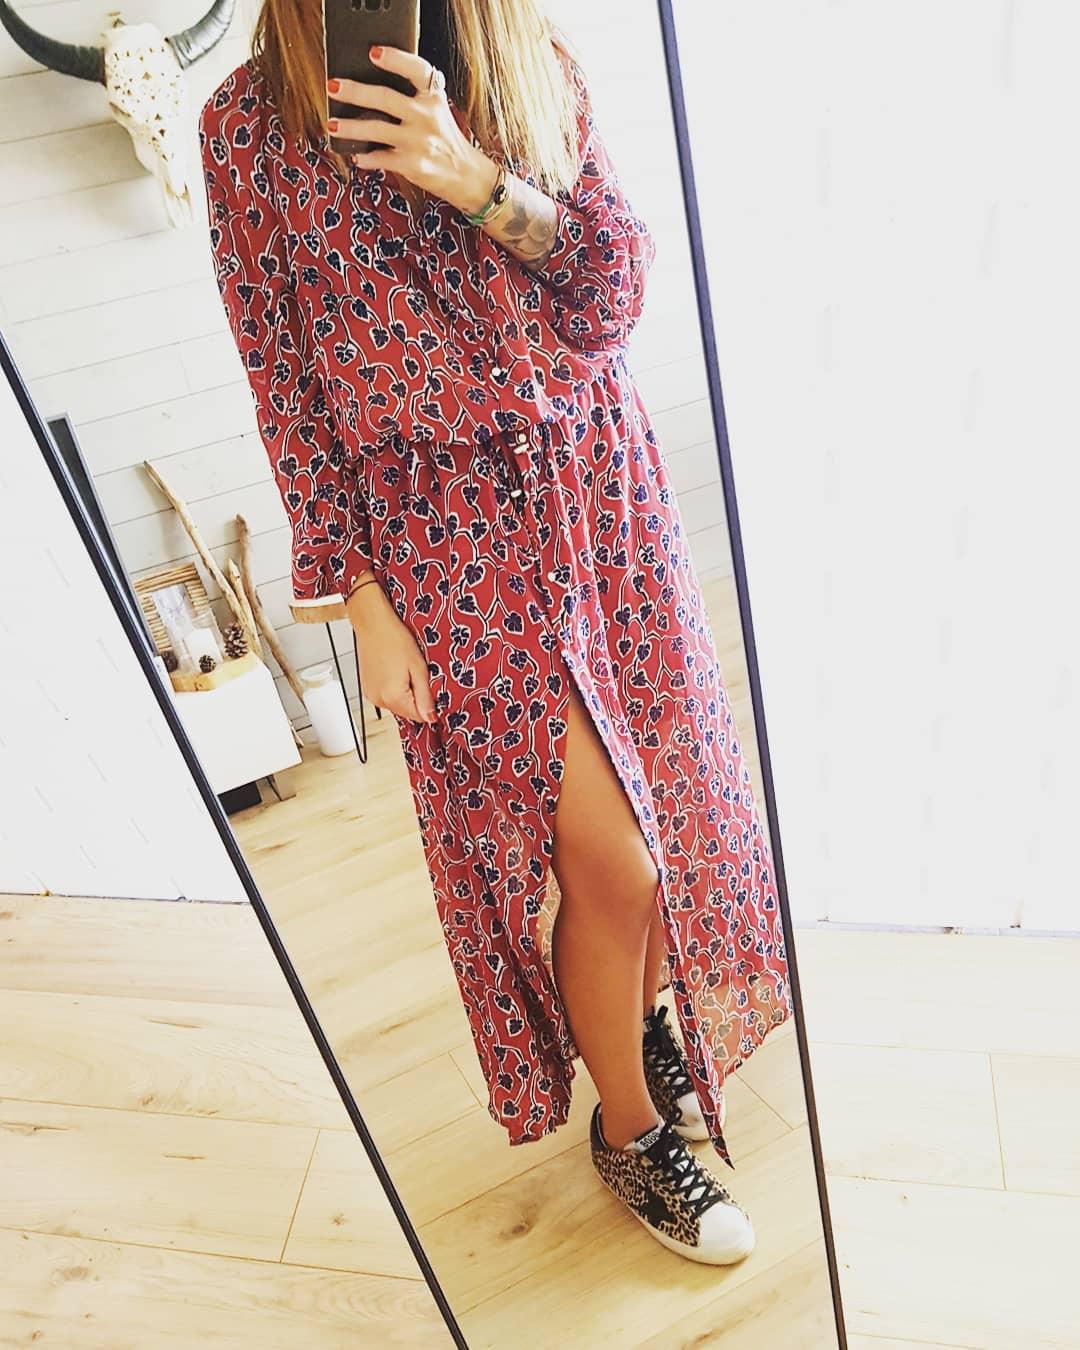 long, leaf-print dress de IKKS sur just_julie13